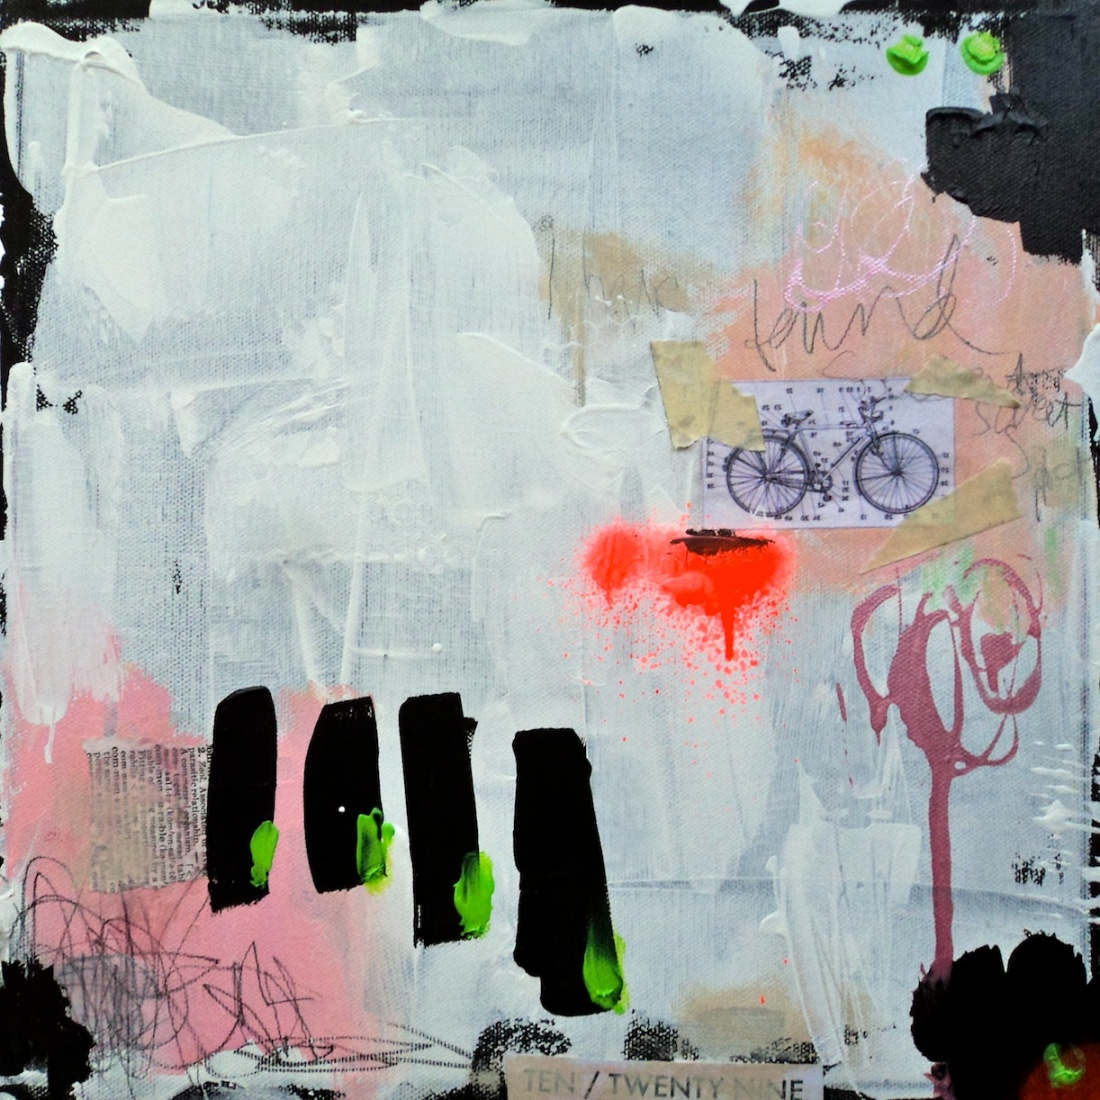 the-magic-bicycle-sm-lorette-c-luzajic-2015